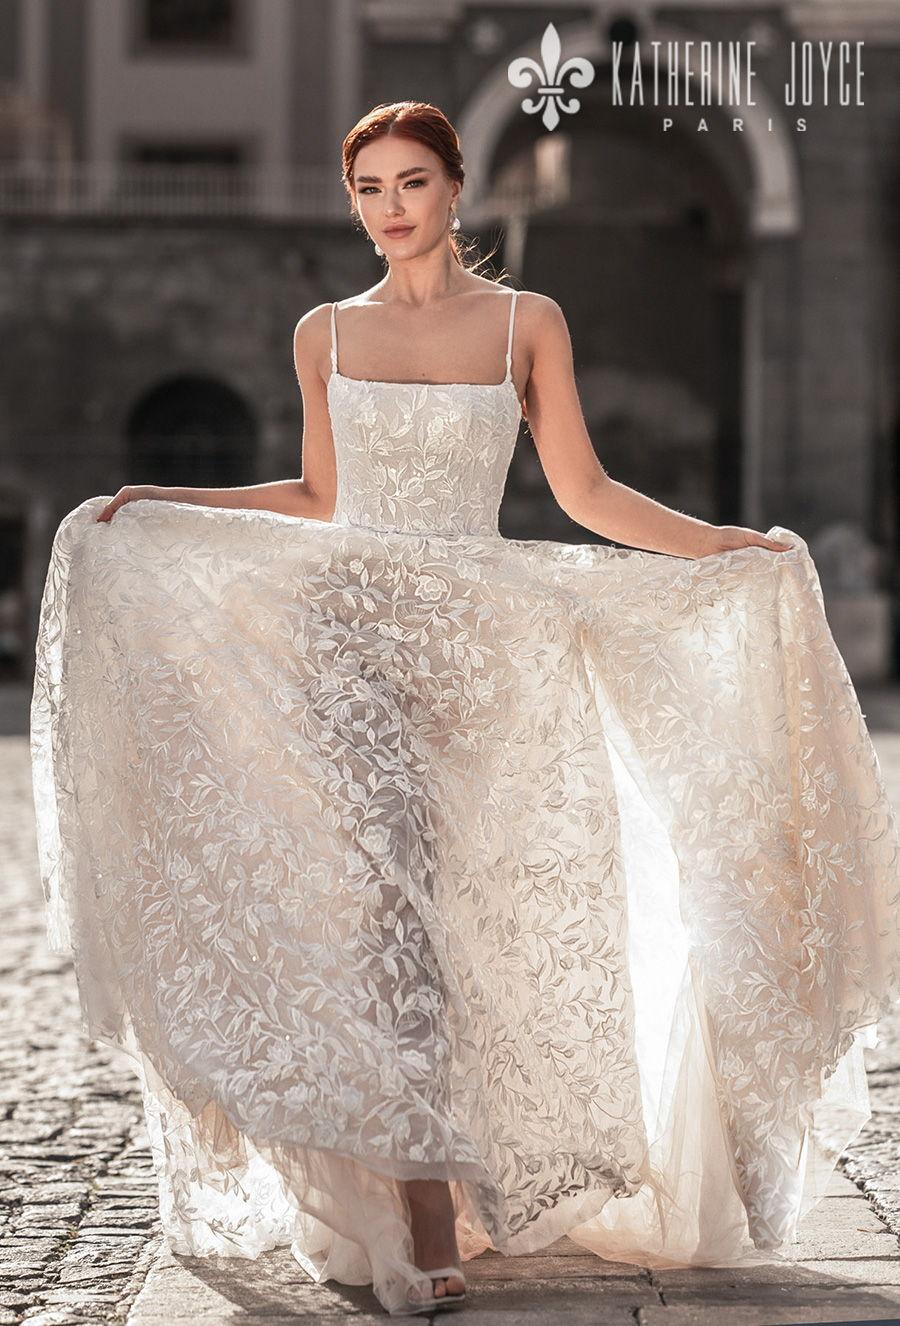 katherine joyce 2021 naples bridal sleeveless spaghetti strap square neckline full embellishment romantic soft a line wedding dress mid back chapel train (irena) mv